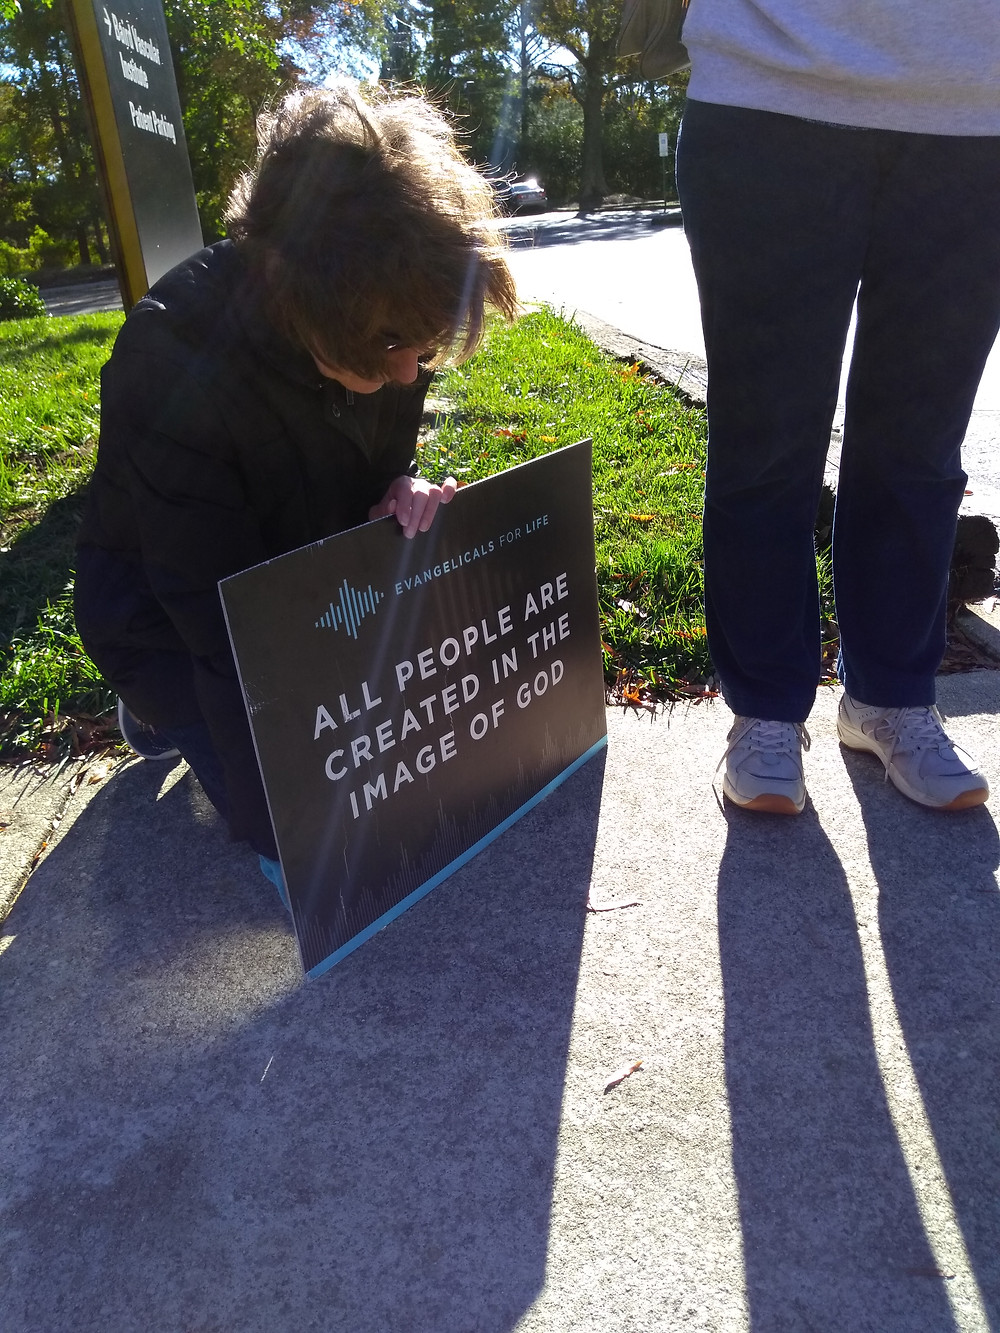 Prayer volunteer kneels in prayer with my sign.